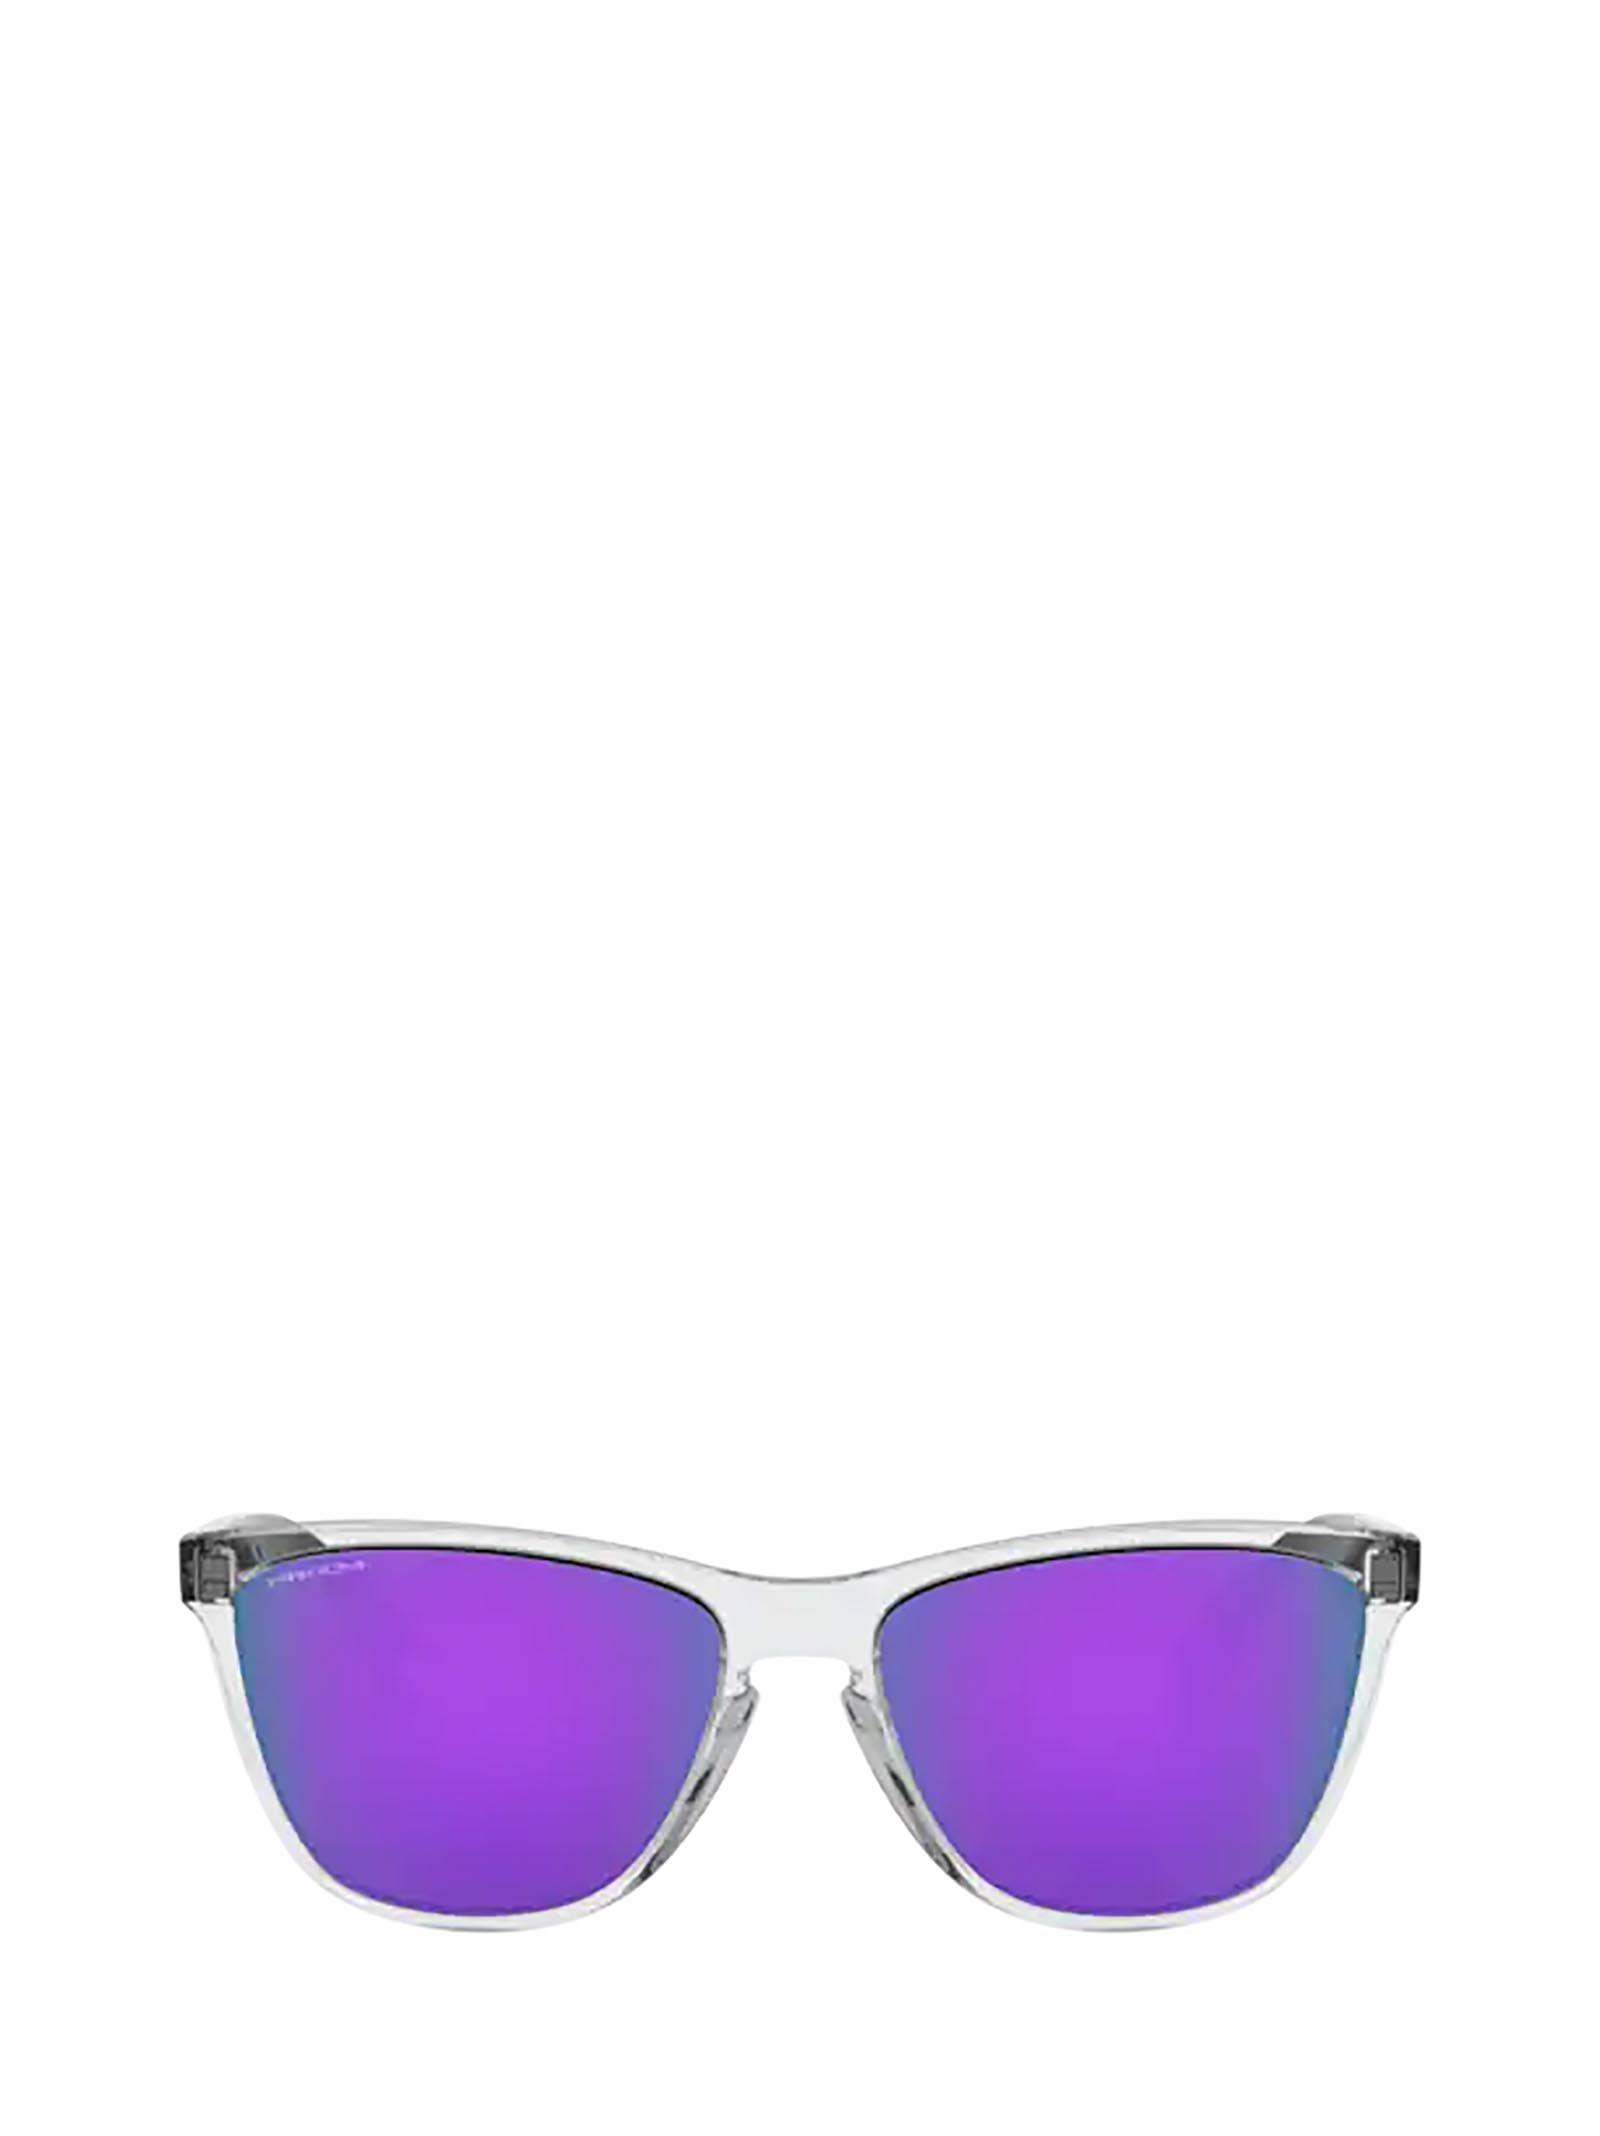 Oakley Women's White Acetate Sunglasses